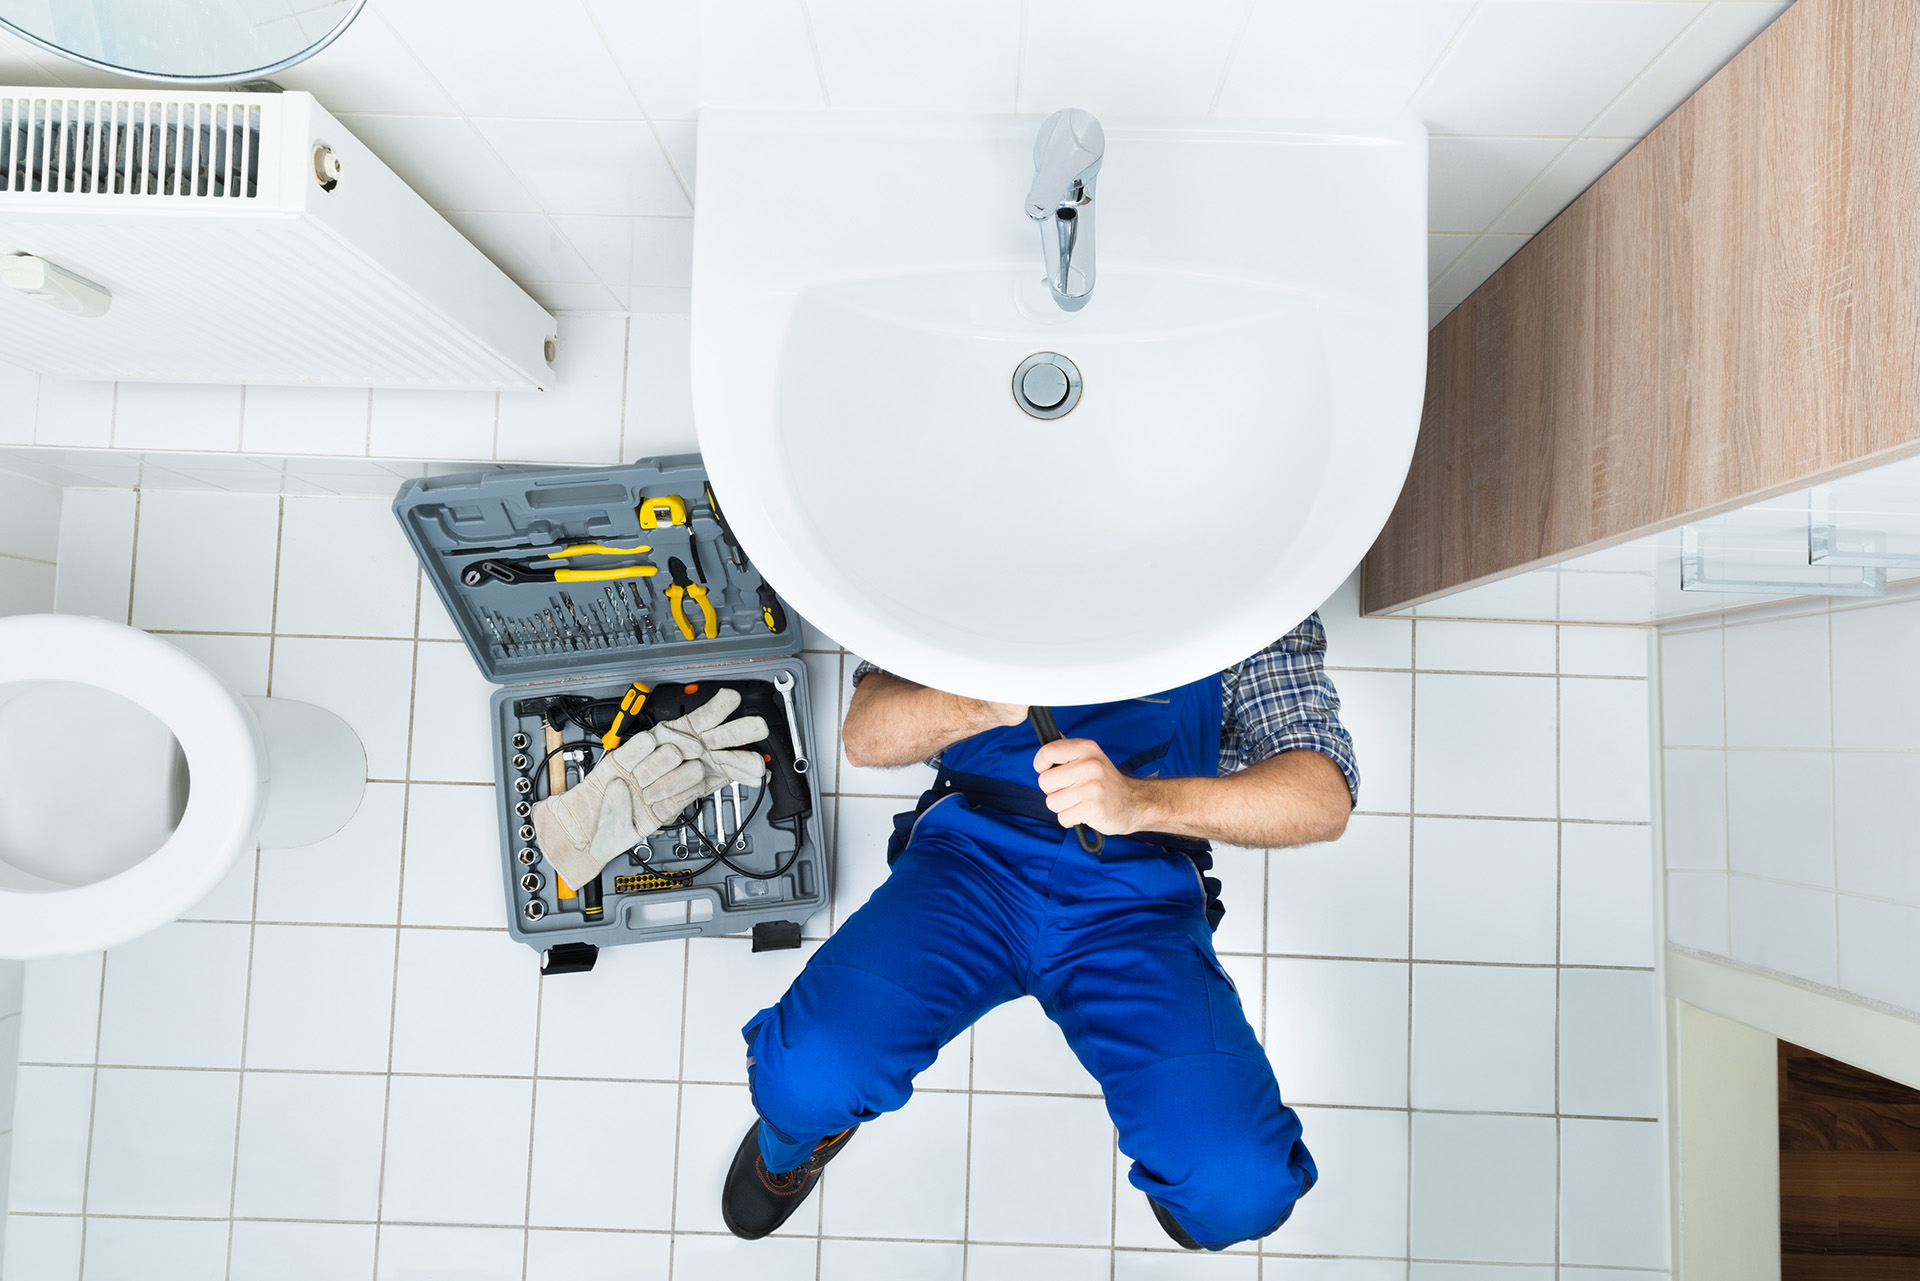 VAGUS HAUSTECHNIK - Repararturarbeiten im Sanitärbereich